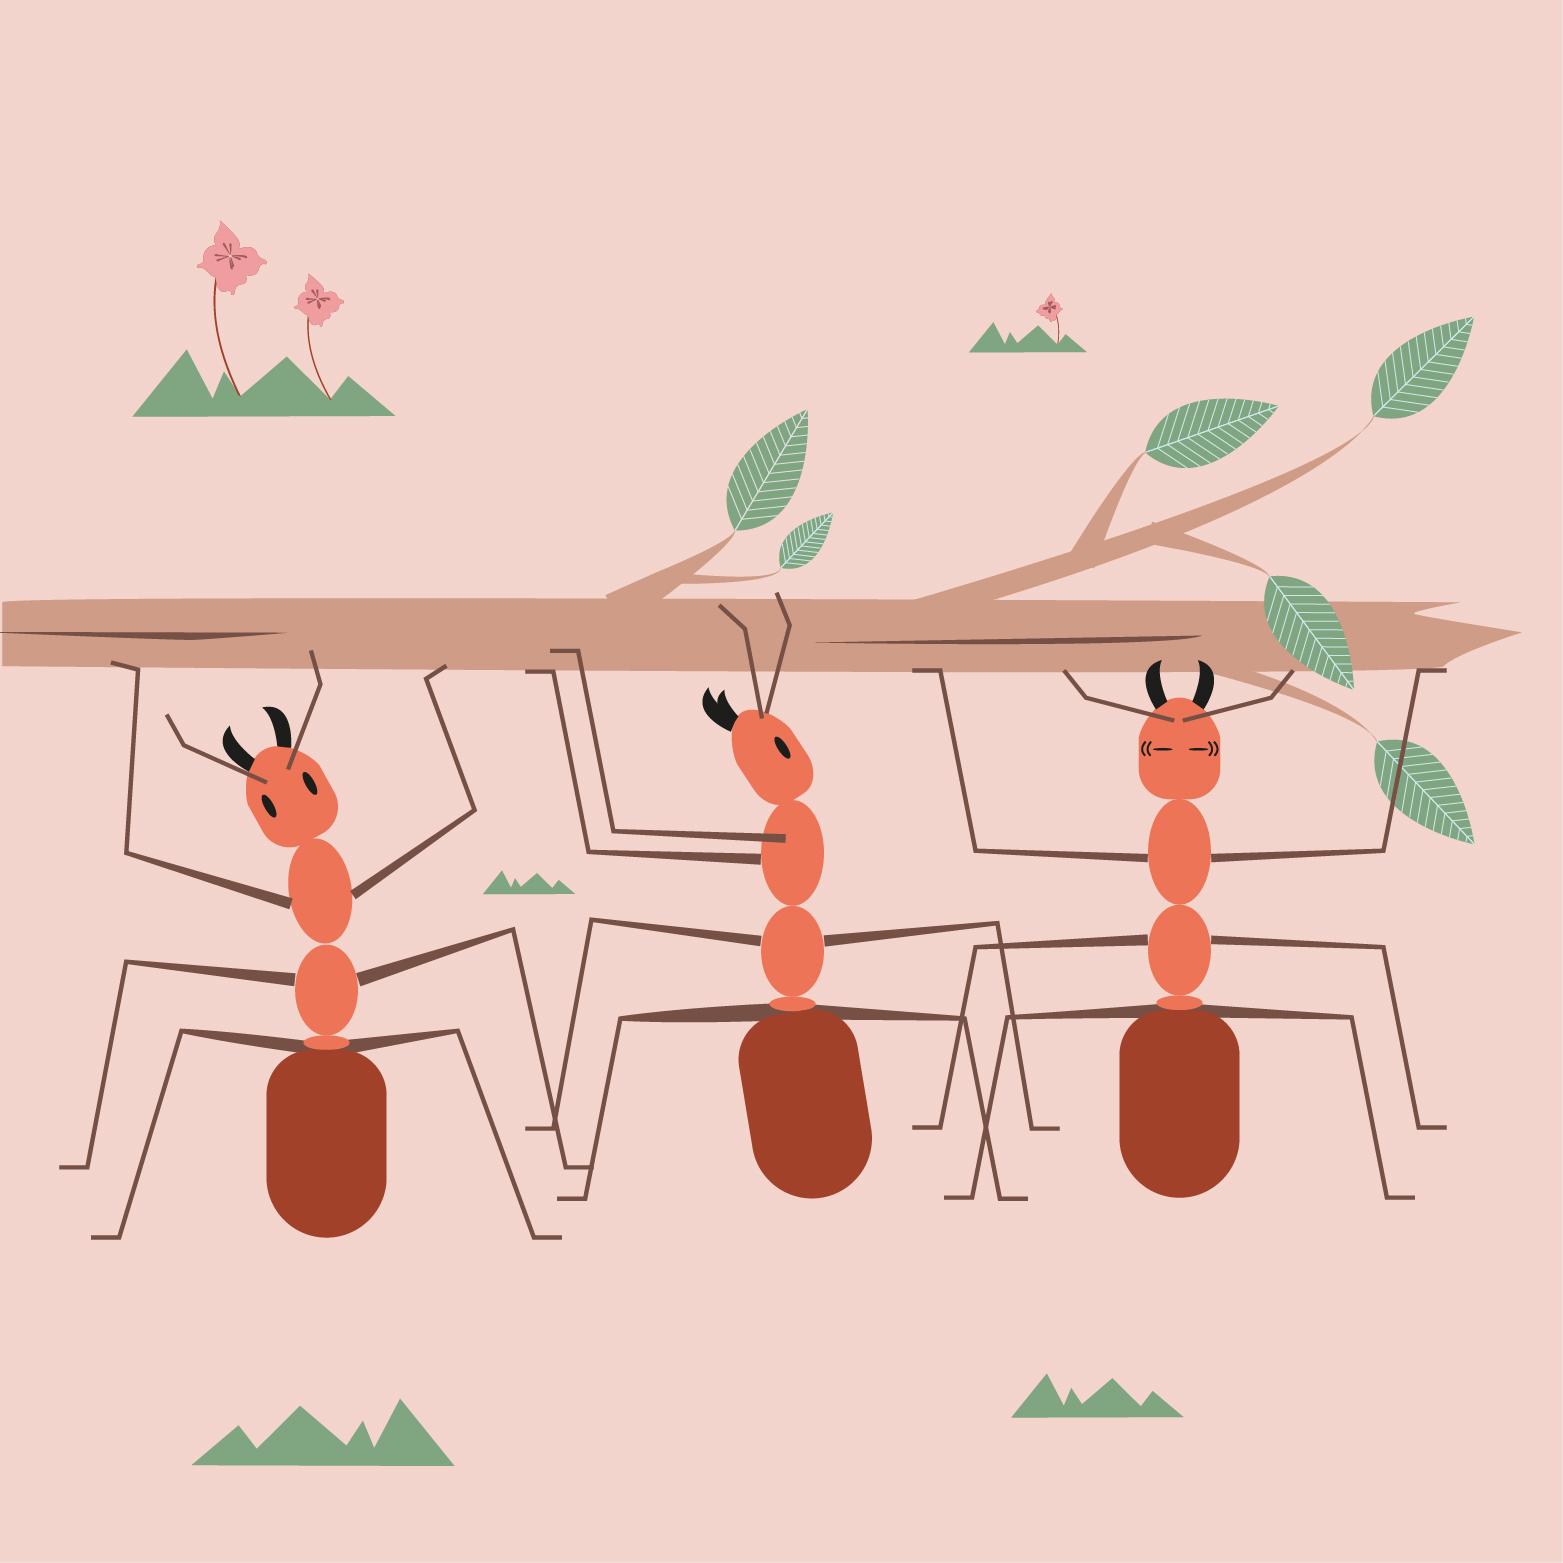 Illustratie mieren - illustrator Dots & Lines - Tilburg